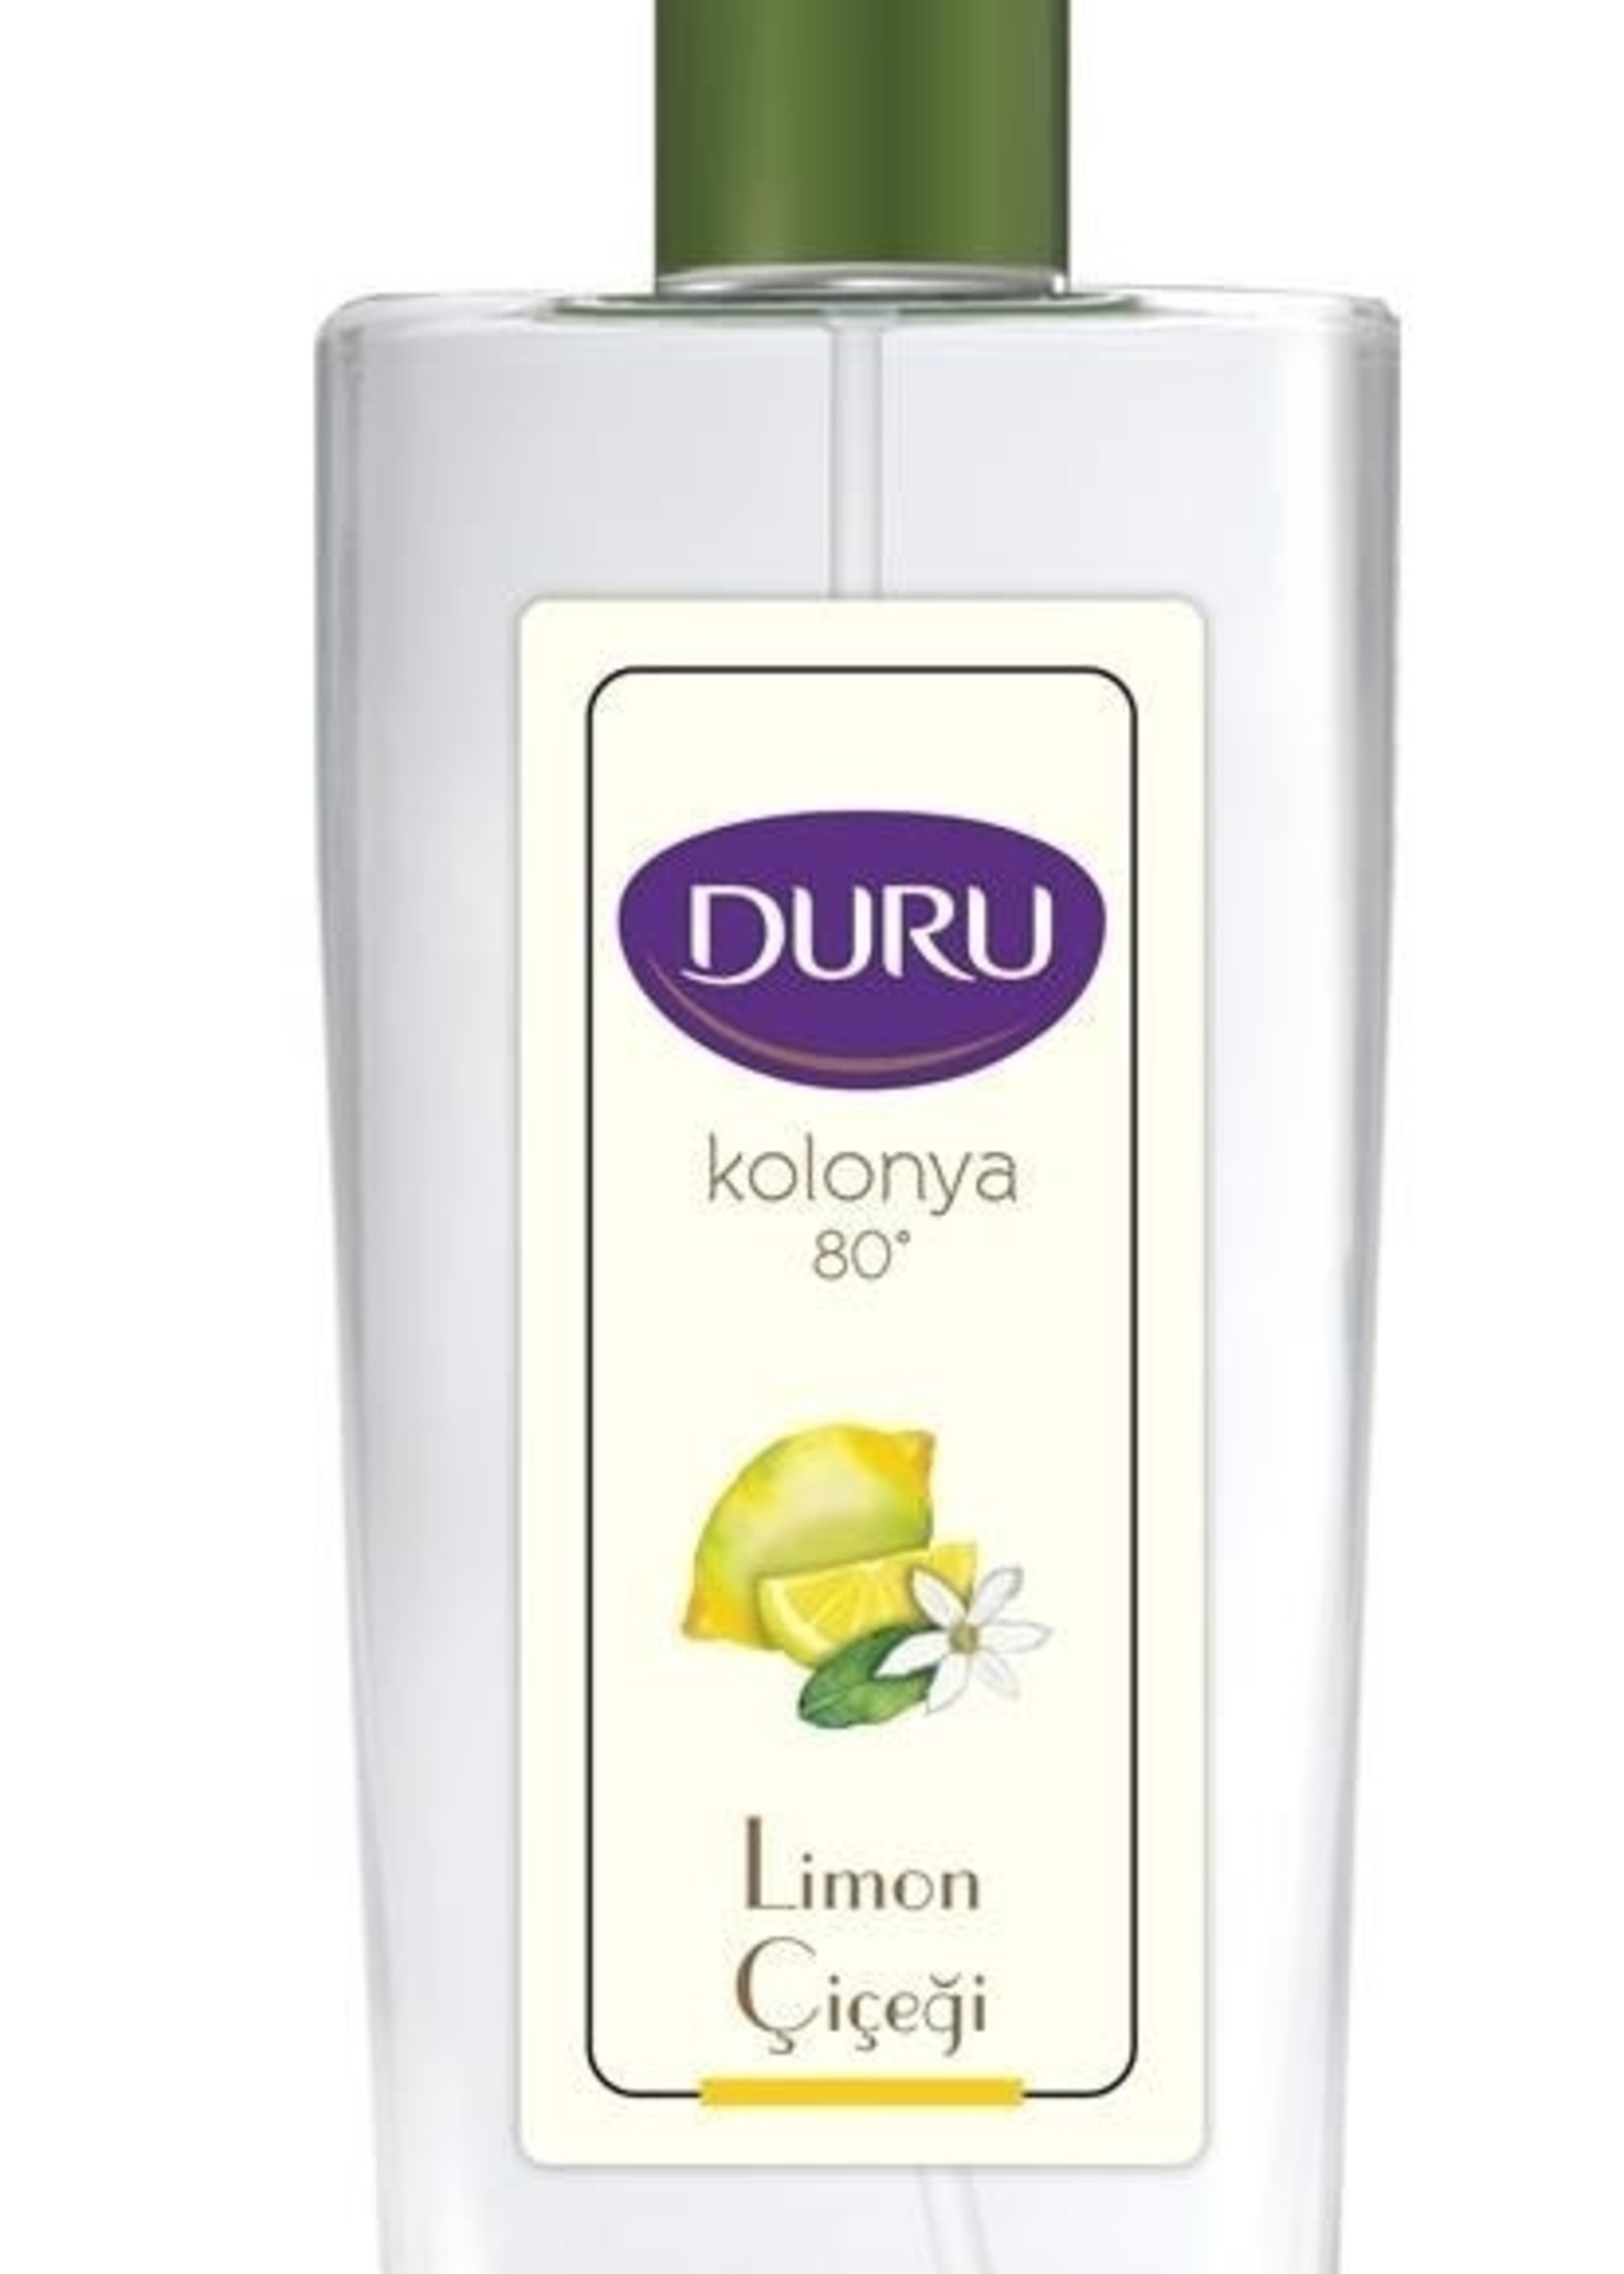 Duru Duru Kolonya Limon Spray 150 ml